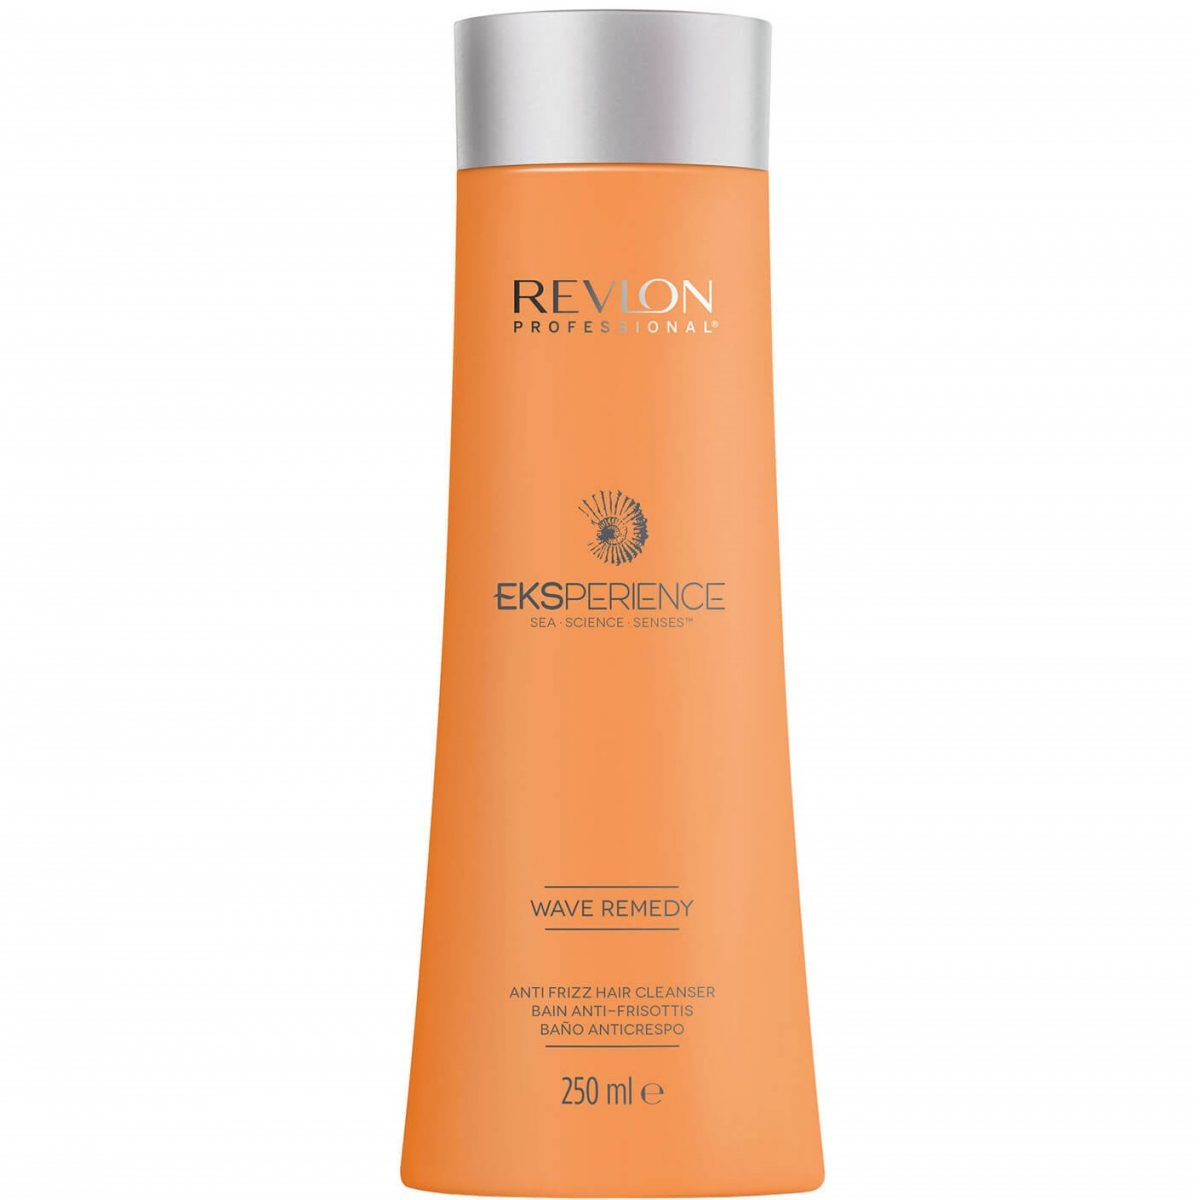 01_Emphase_Revlon_Eksperience_Wave_Remedy_Shampoo_250ml